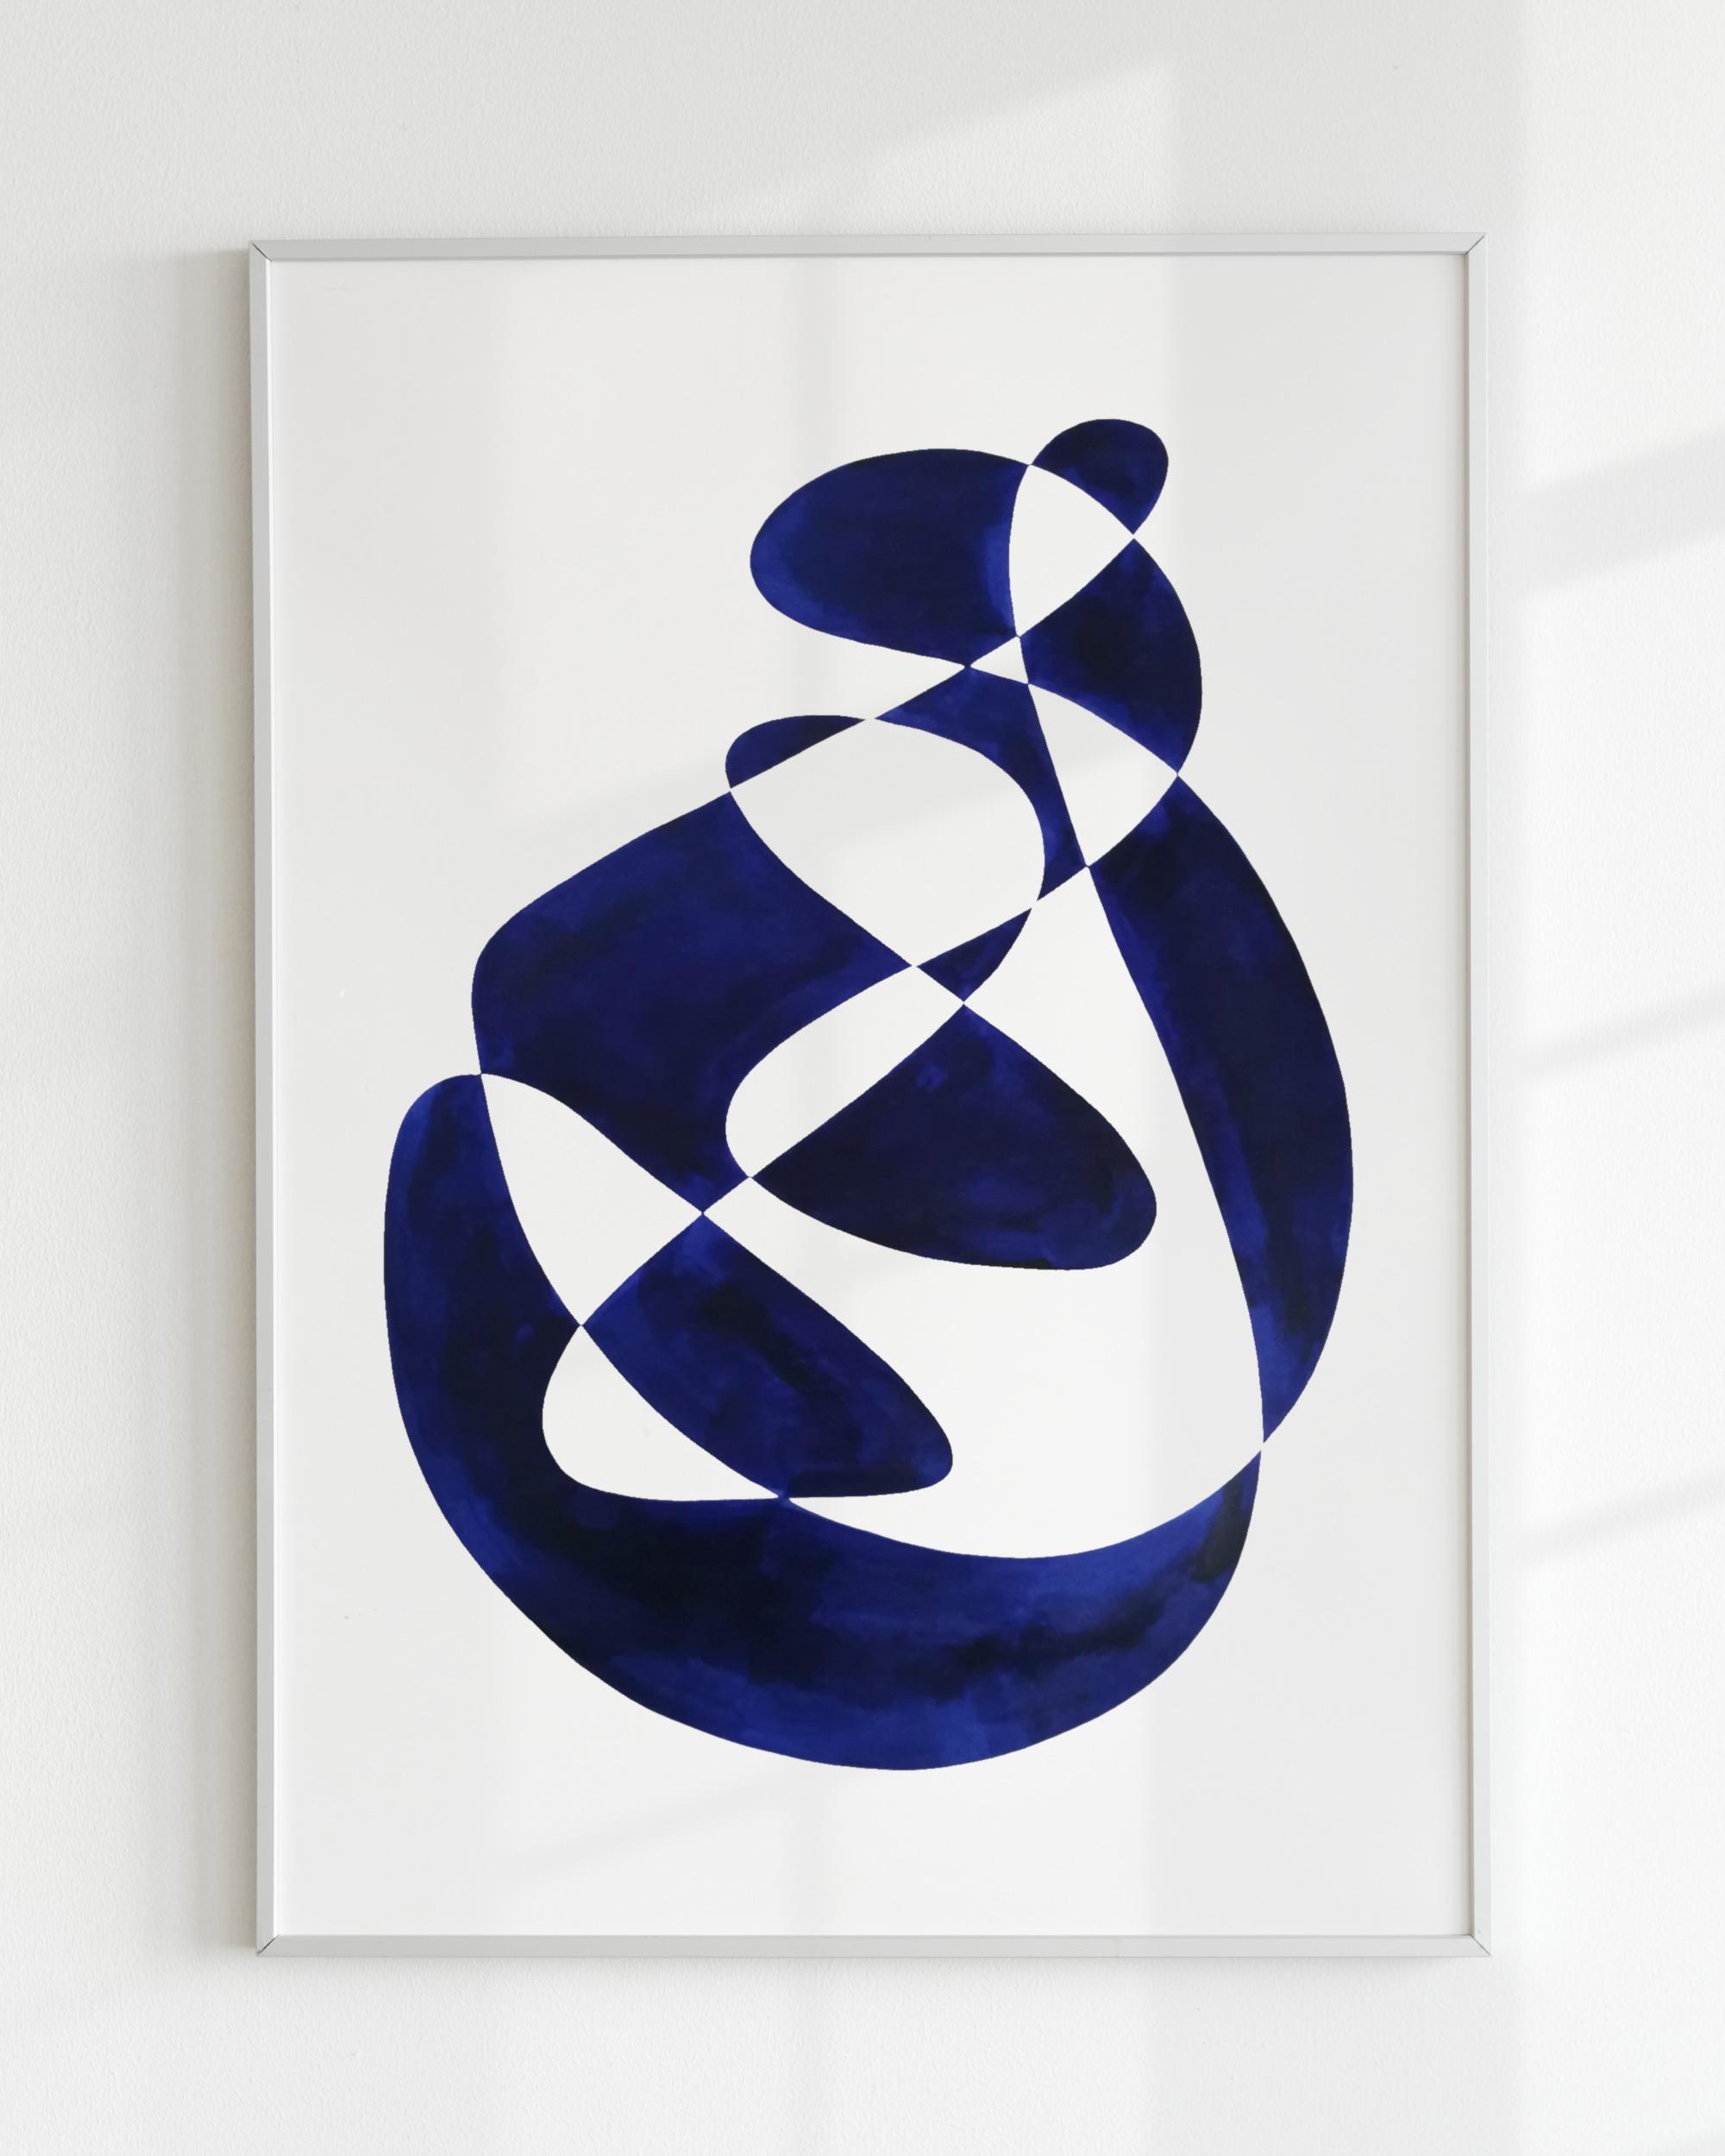 SHAPE STUDY – Bleu de prusse small I